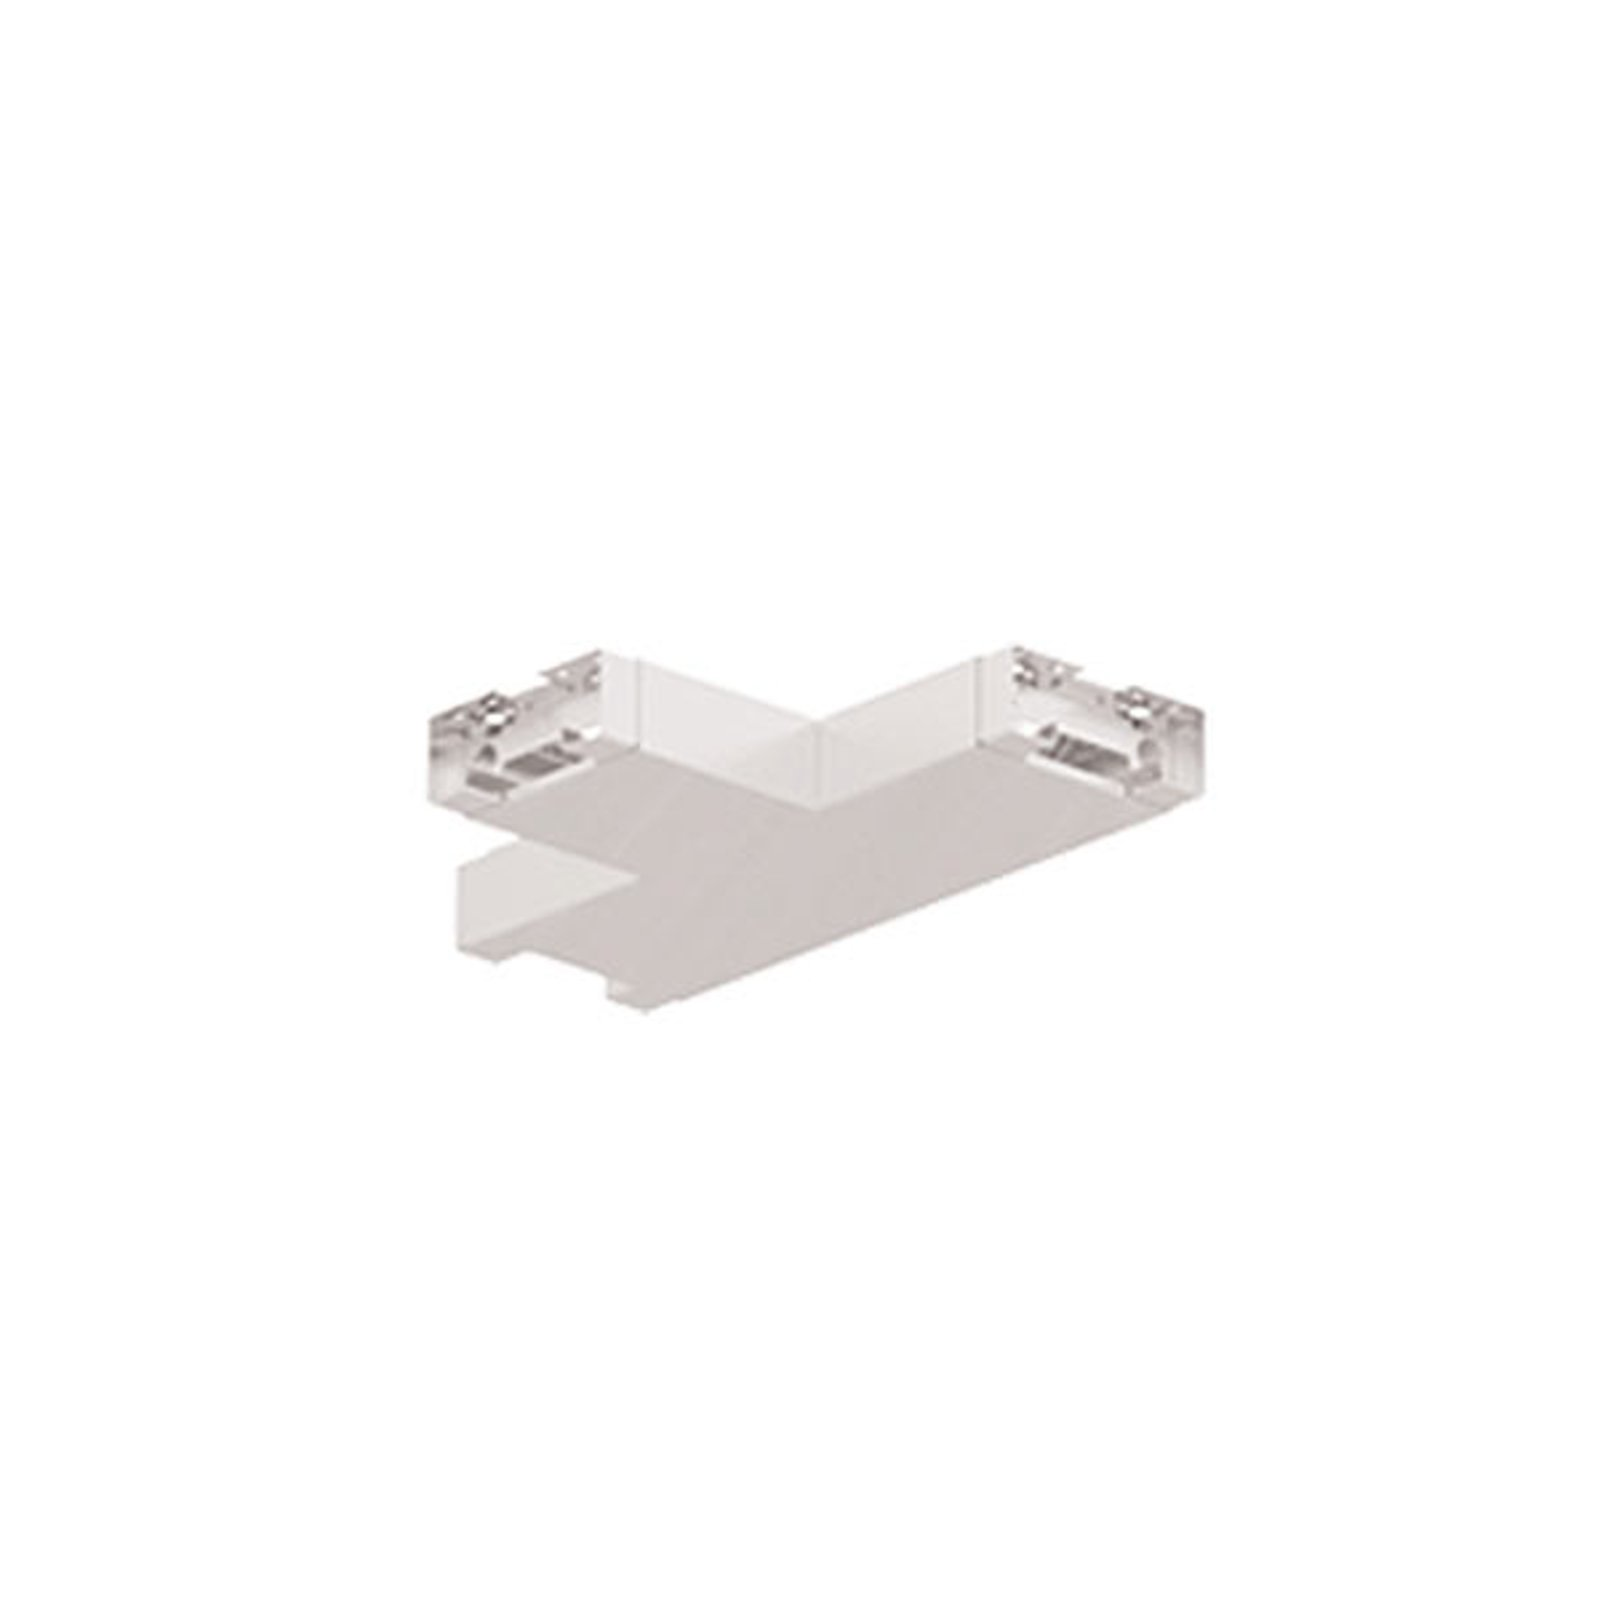 Forbinder Procube-CUVT-1 T90° for DL Procube